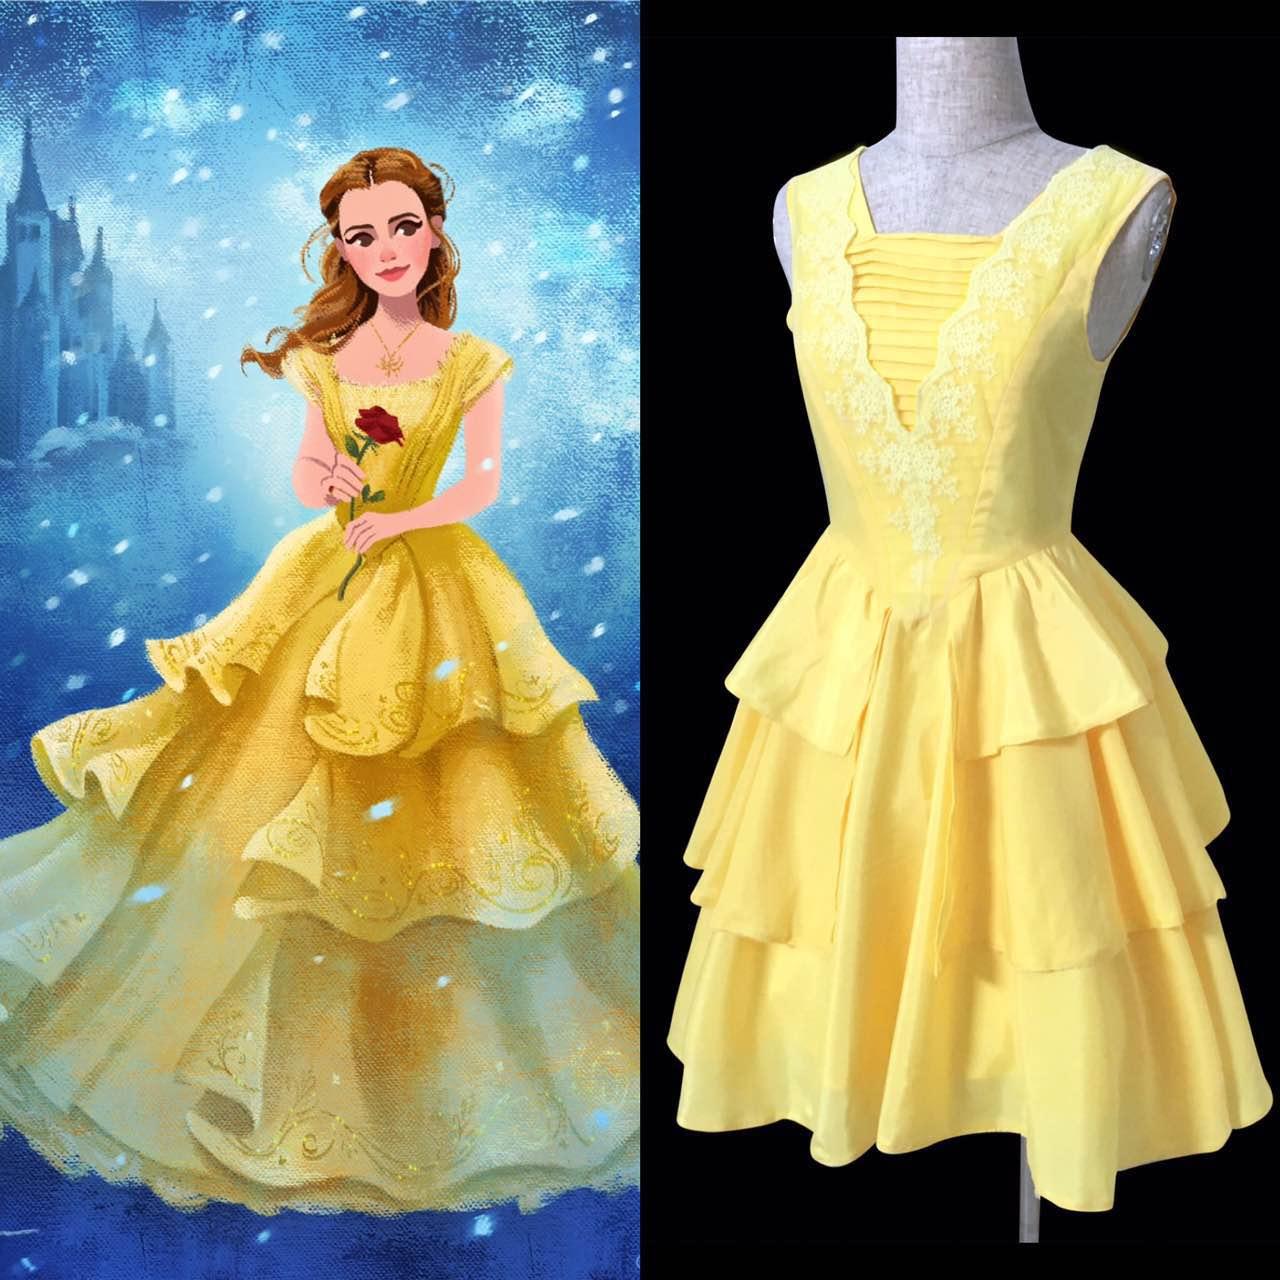 bm110 belle 2017 yellow dress disneybound 183 angelsecret